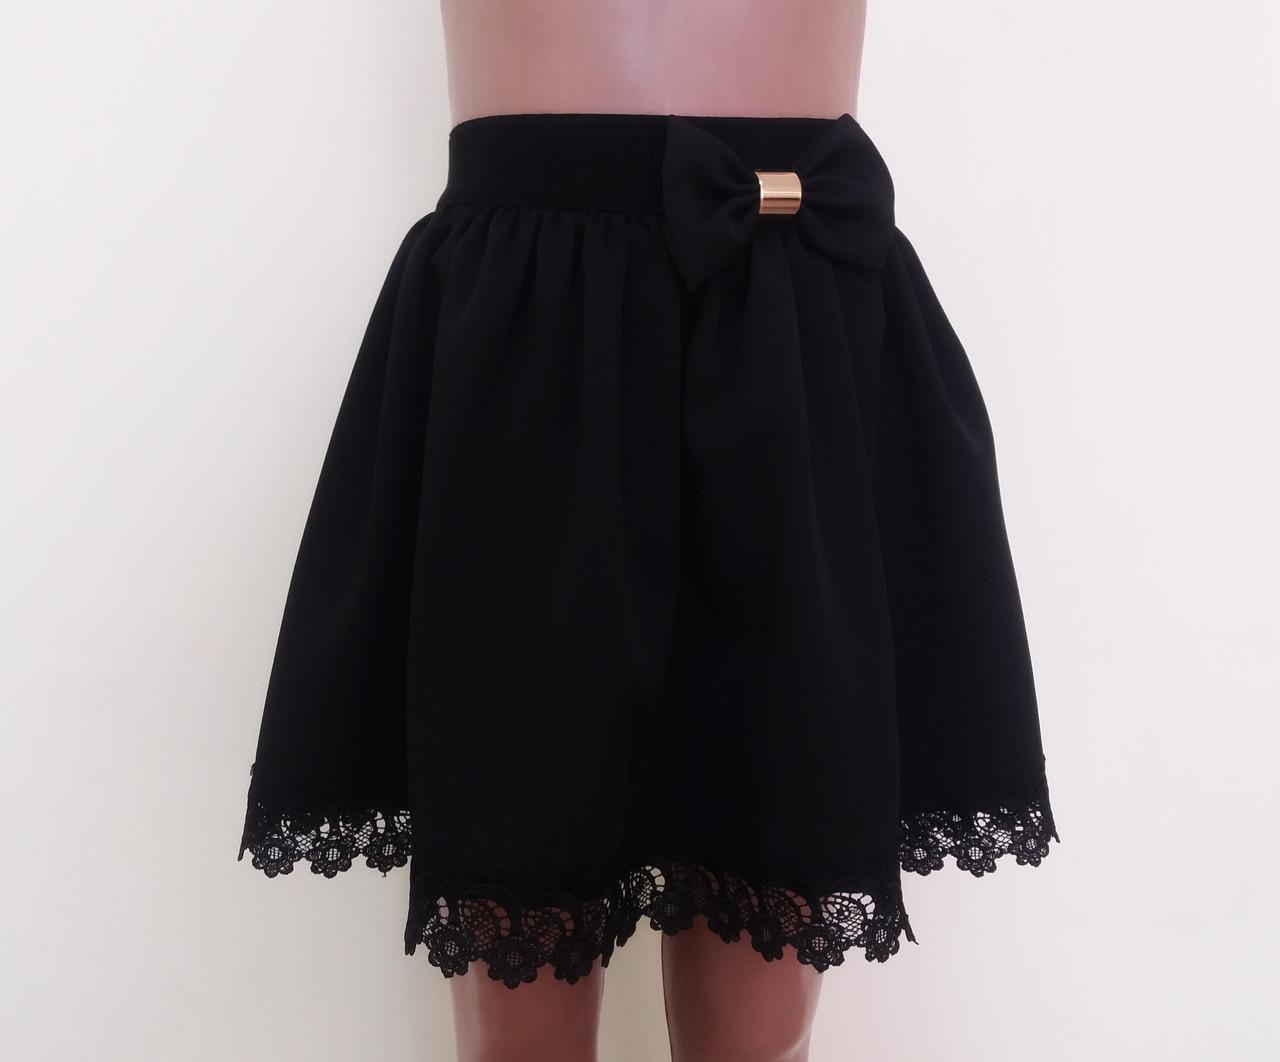 12d3b998e89 Детская школьная юбка на резинке «Ромашка»